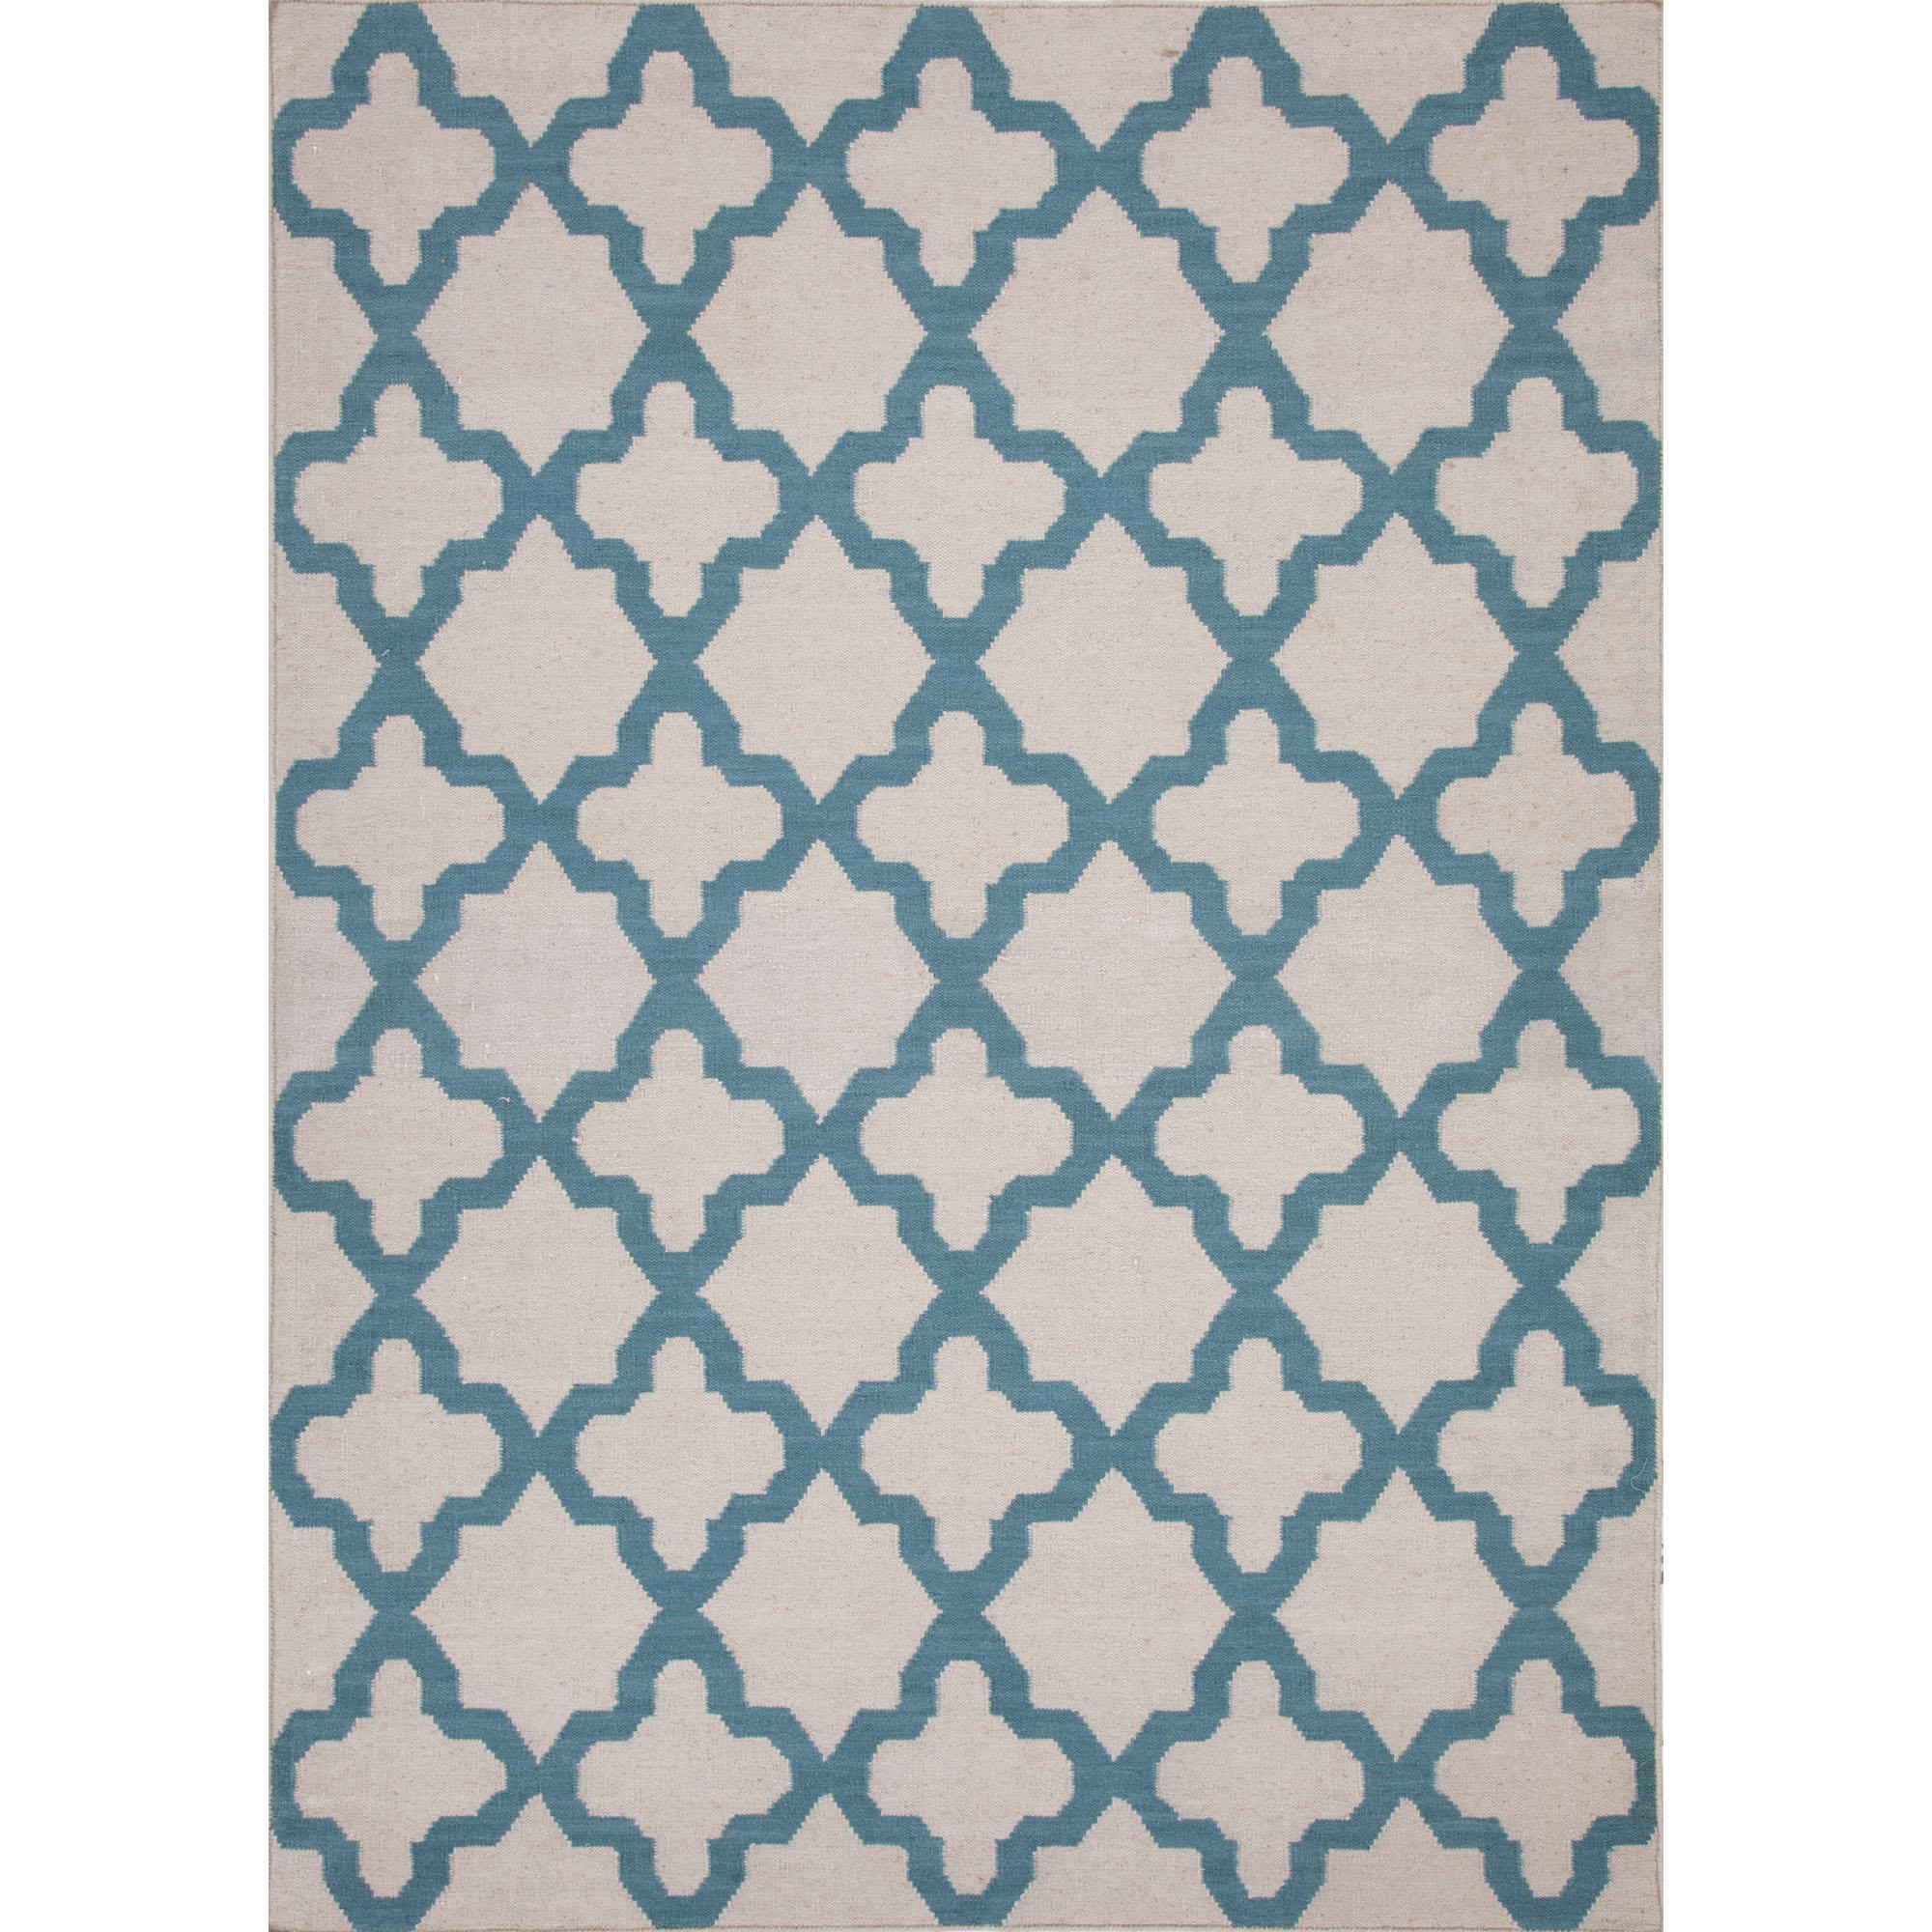 JAIPUR Rugs Maroc 2 x 3 Rug - Item Number: RUG102840